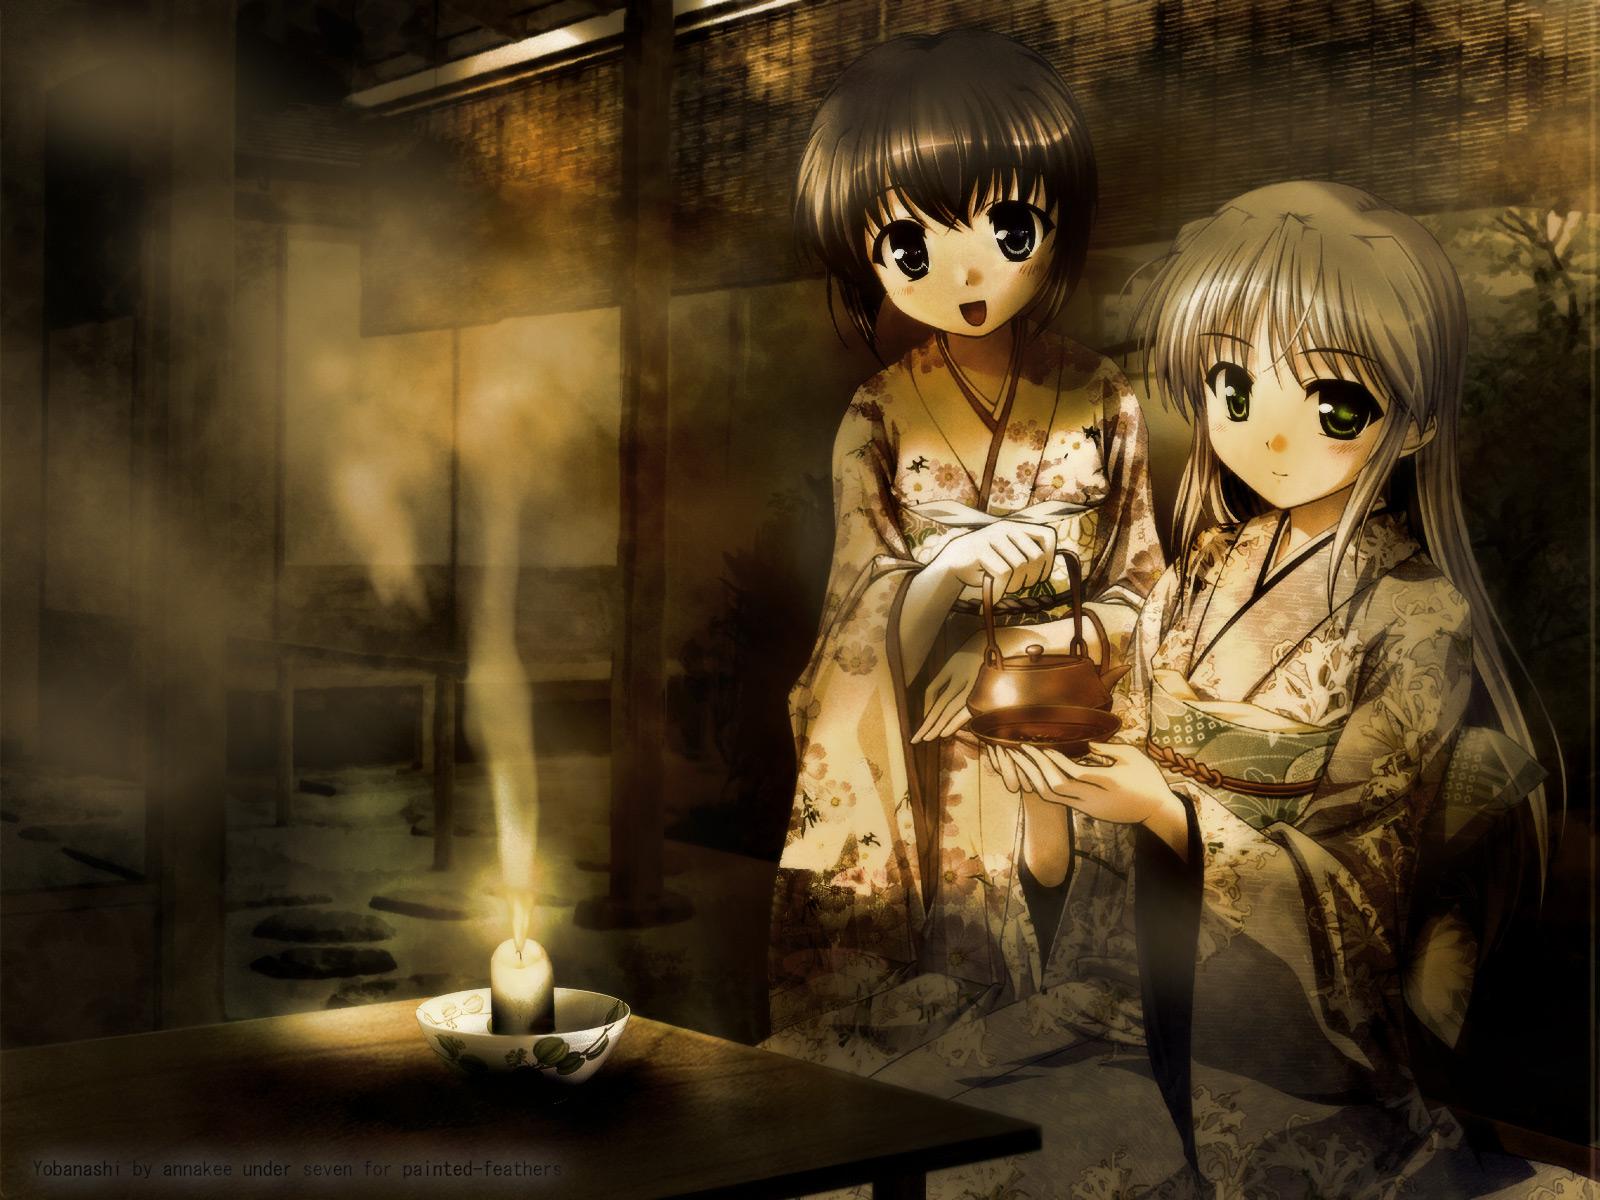 feena_fam_earthlight japanese_clothes kimono mia_clementis yoake_mae_yori_ruri_iro_na